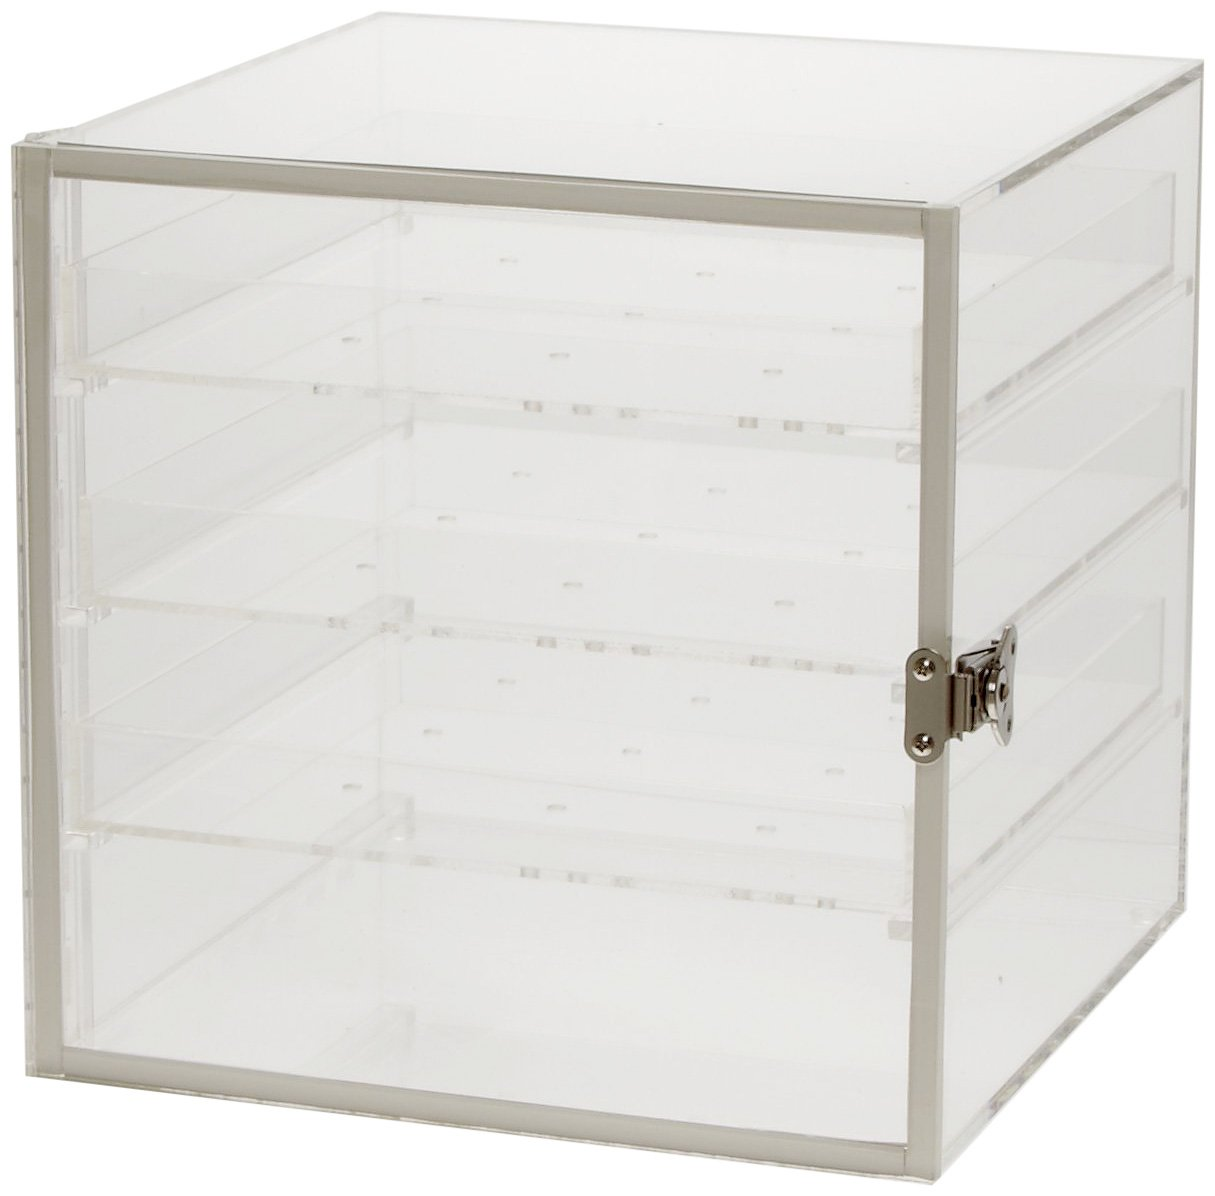 Bel-Art Clear Acrylic Desiccator Cabinet; 0.82 cu. Ft (F42066-0000)